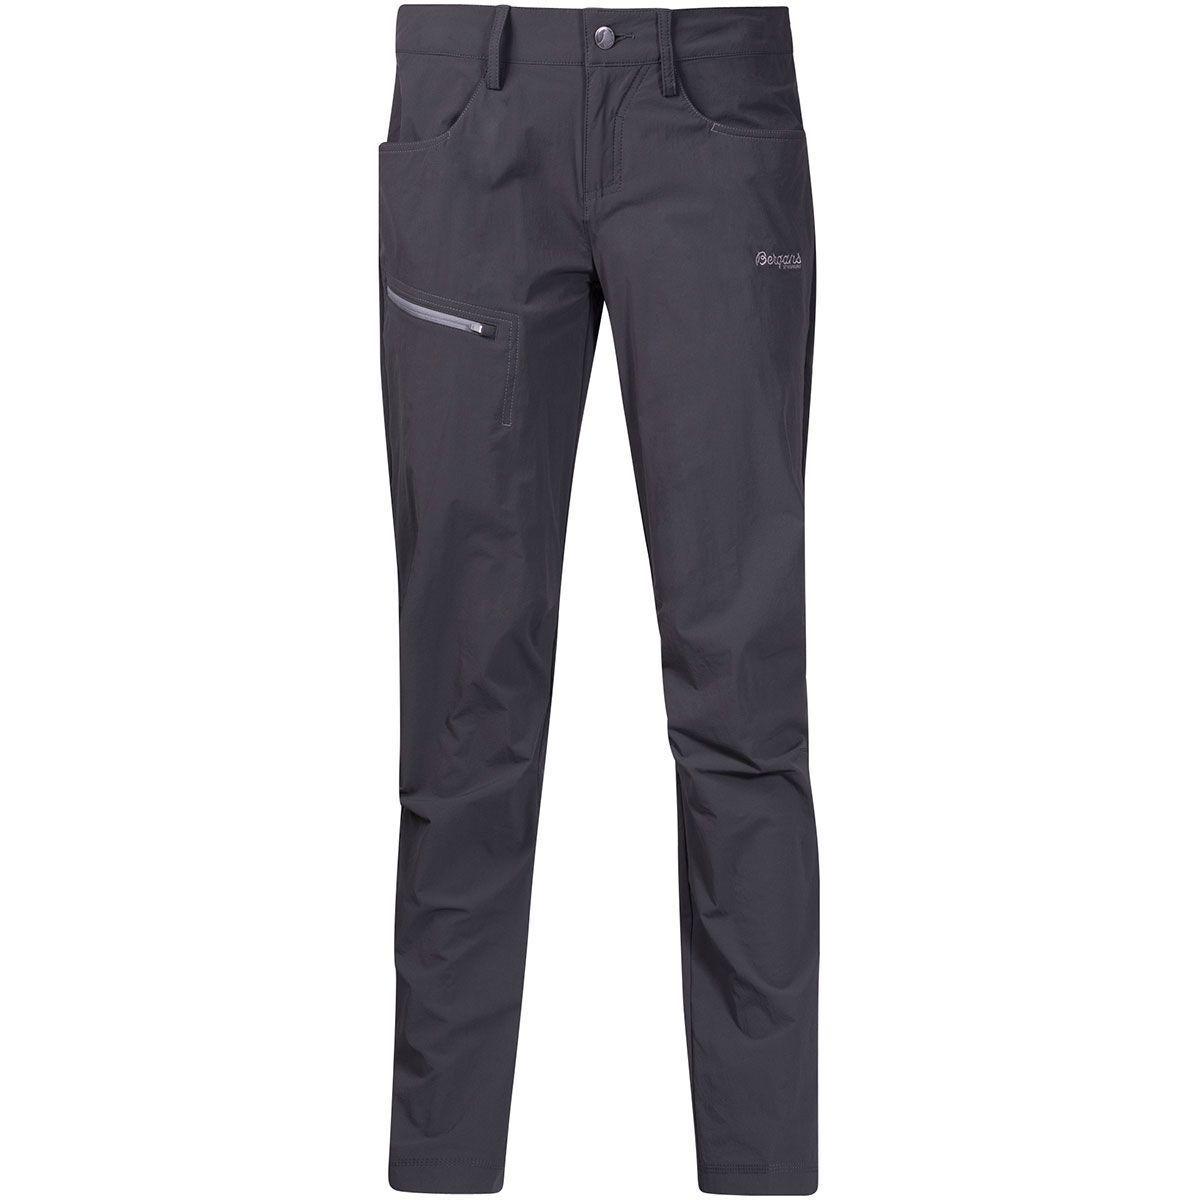 Bergans Moa Lady Pant solid charcoal  solid grau Größe XL NEU  | Eleganter Stil